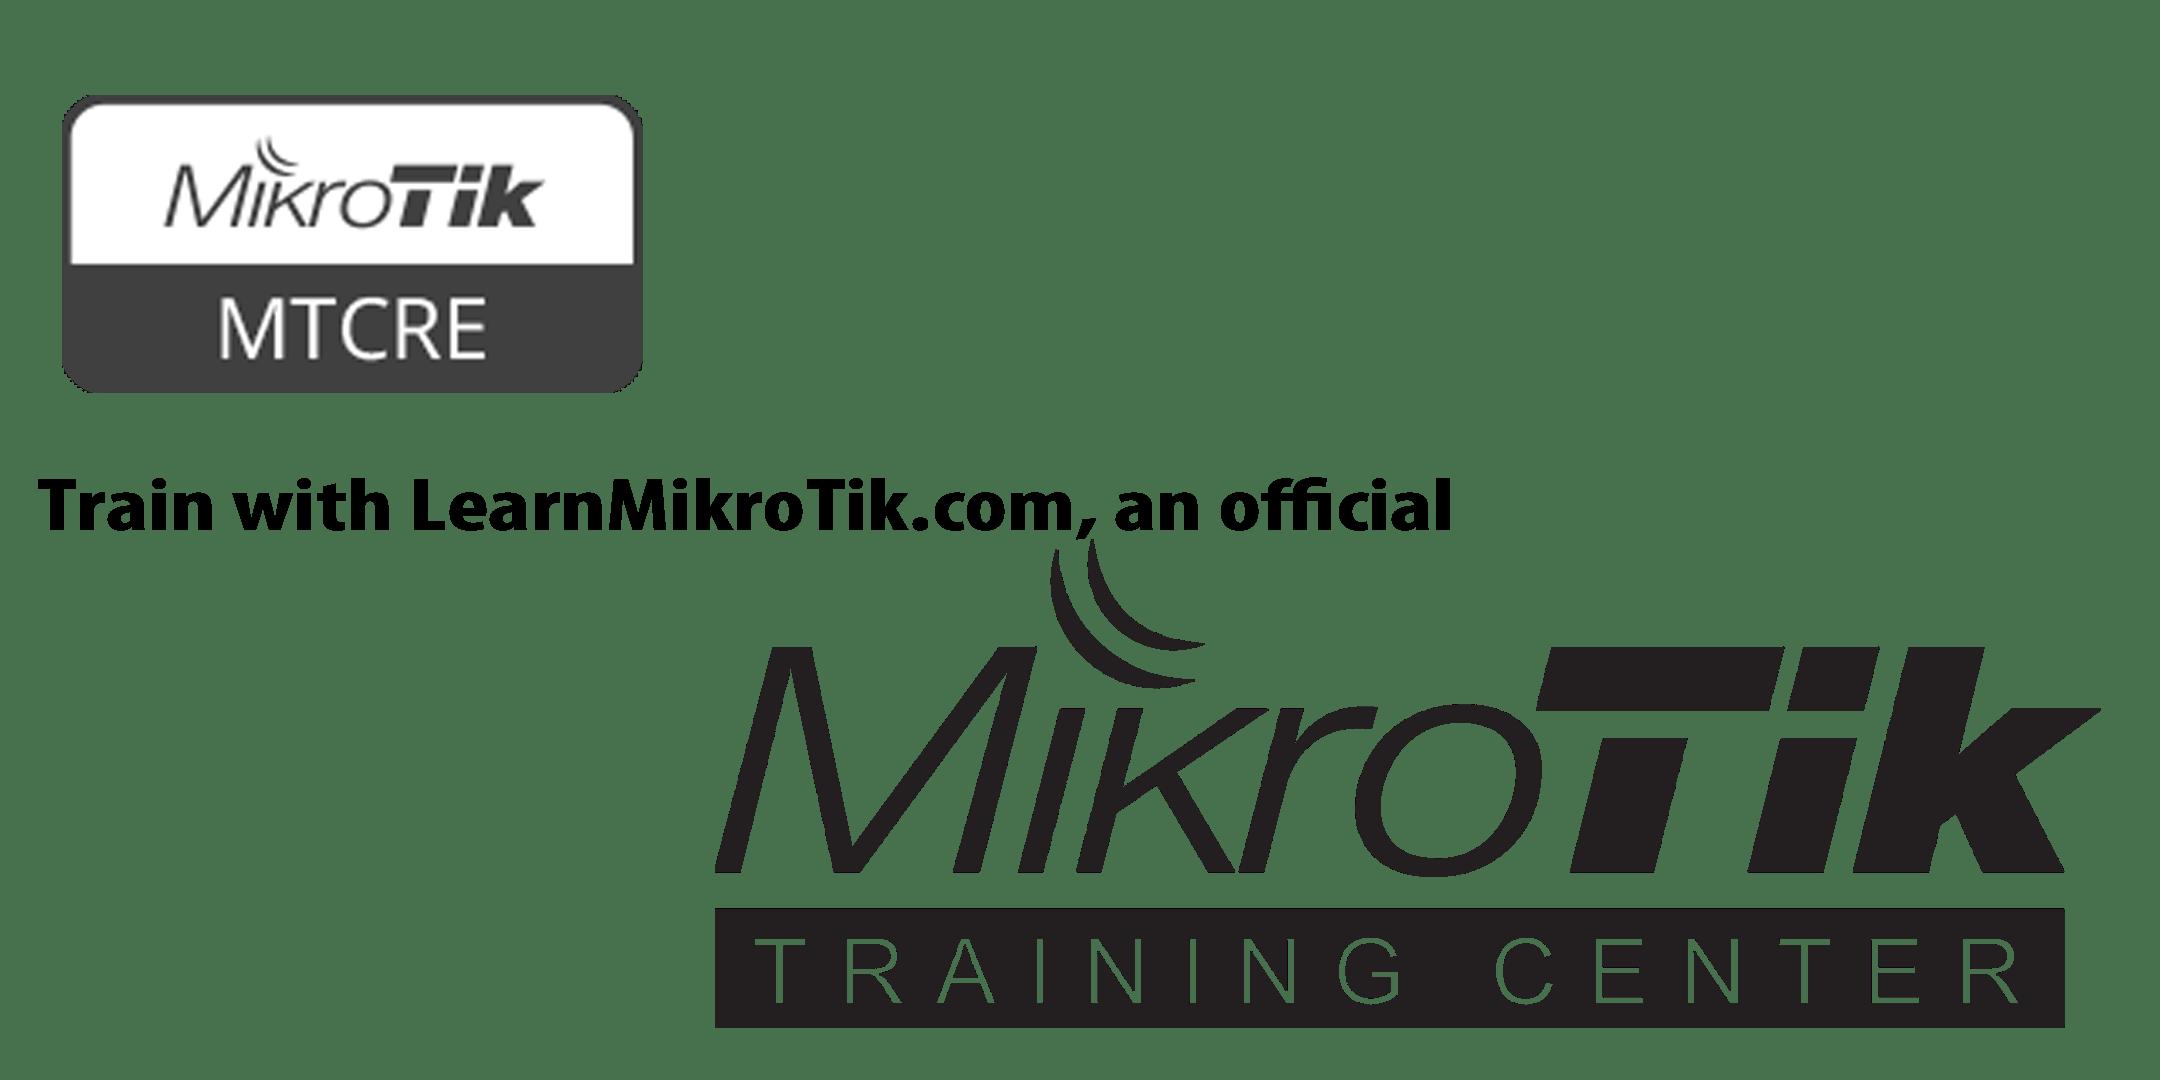 MikroTik MTCRE Training at the US MUM Austin Texas April 2019